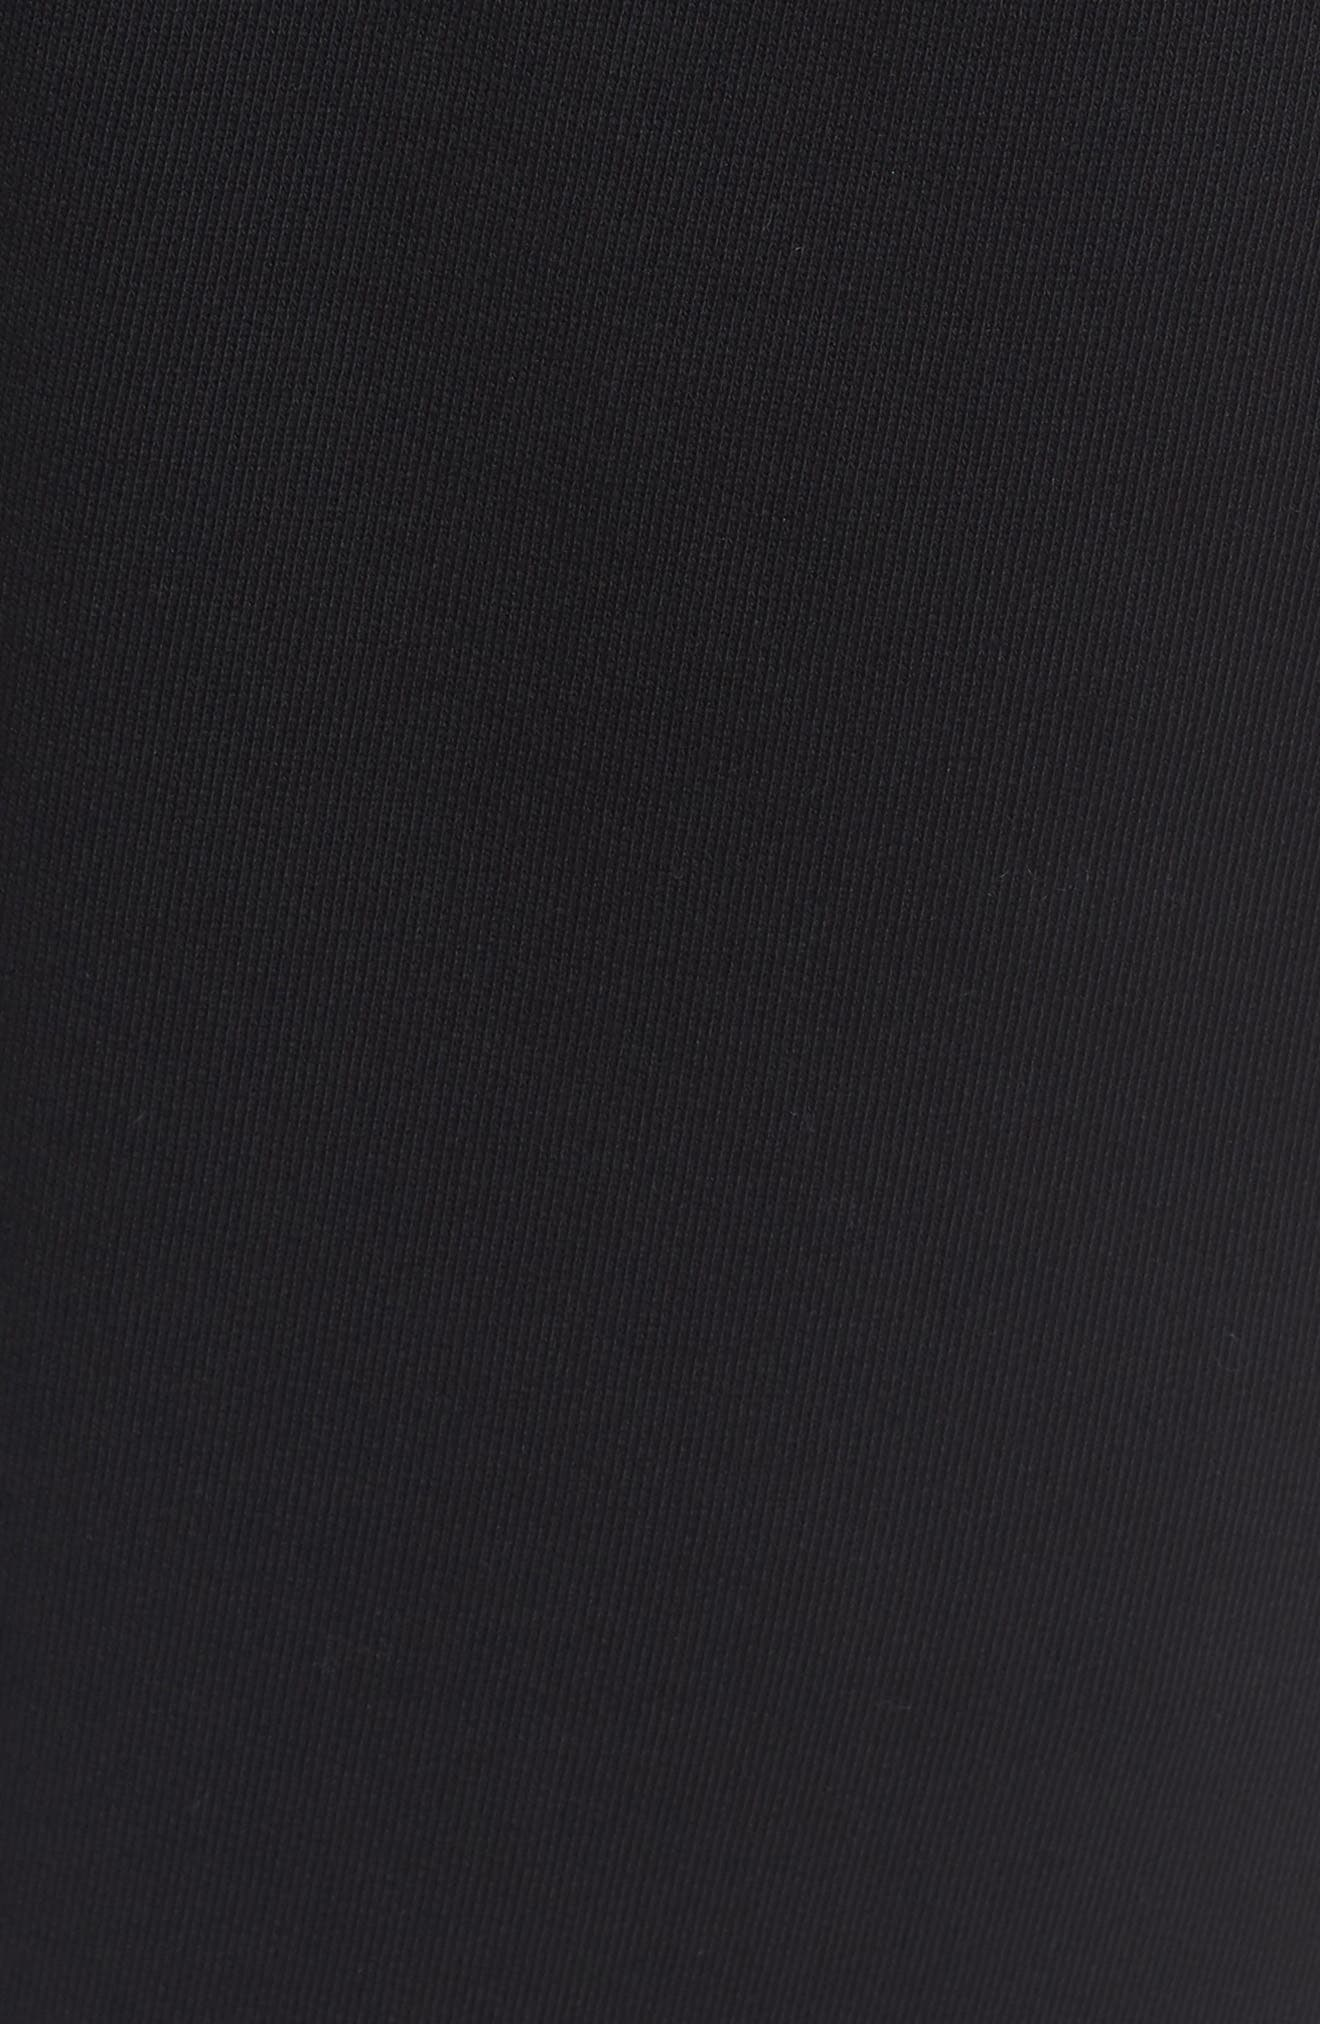 Mix Media Regular Fit Cotton Sweatpants,                             Alternate thumbnail 5, color,                             BLACK